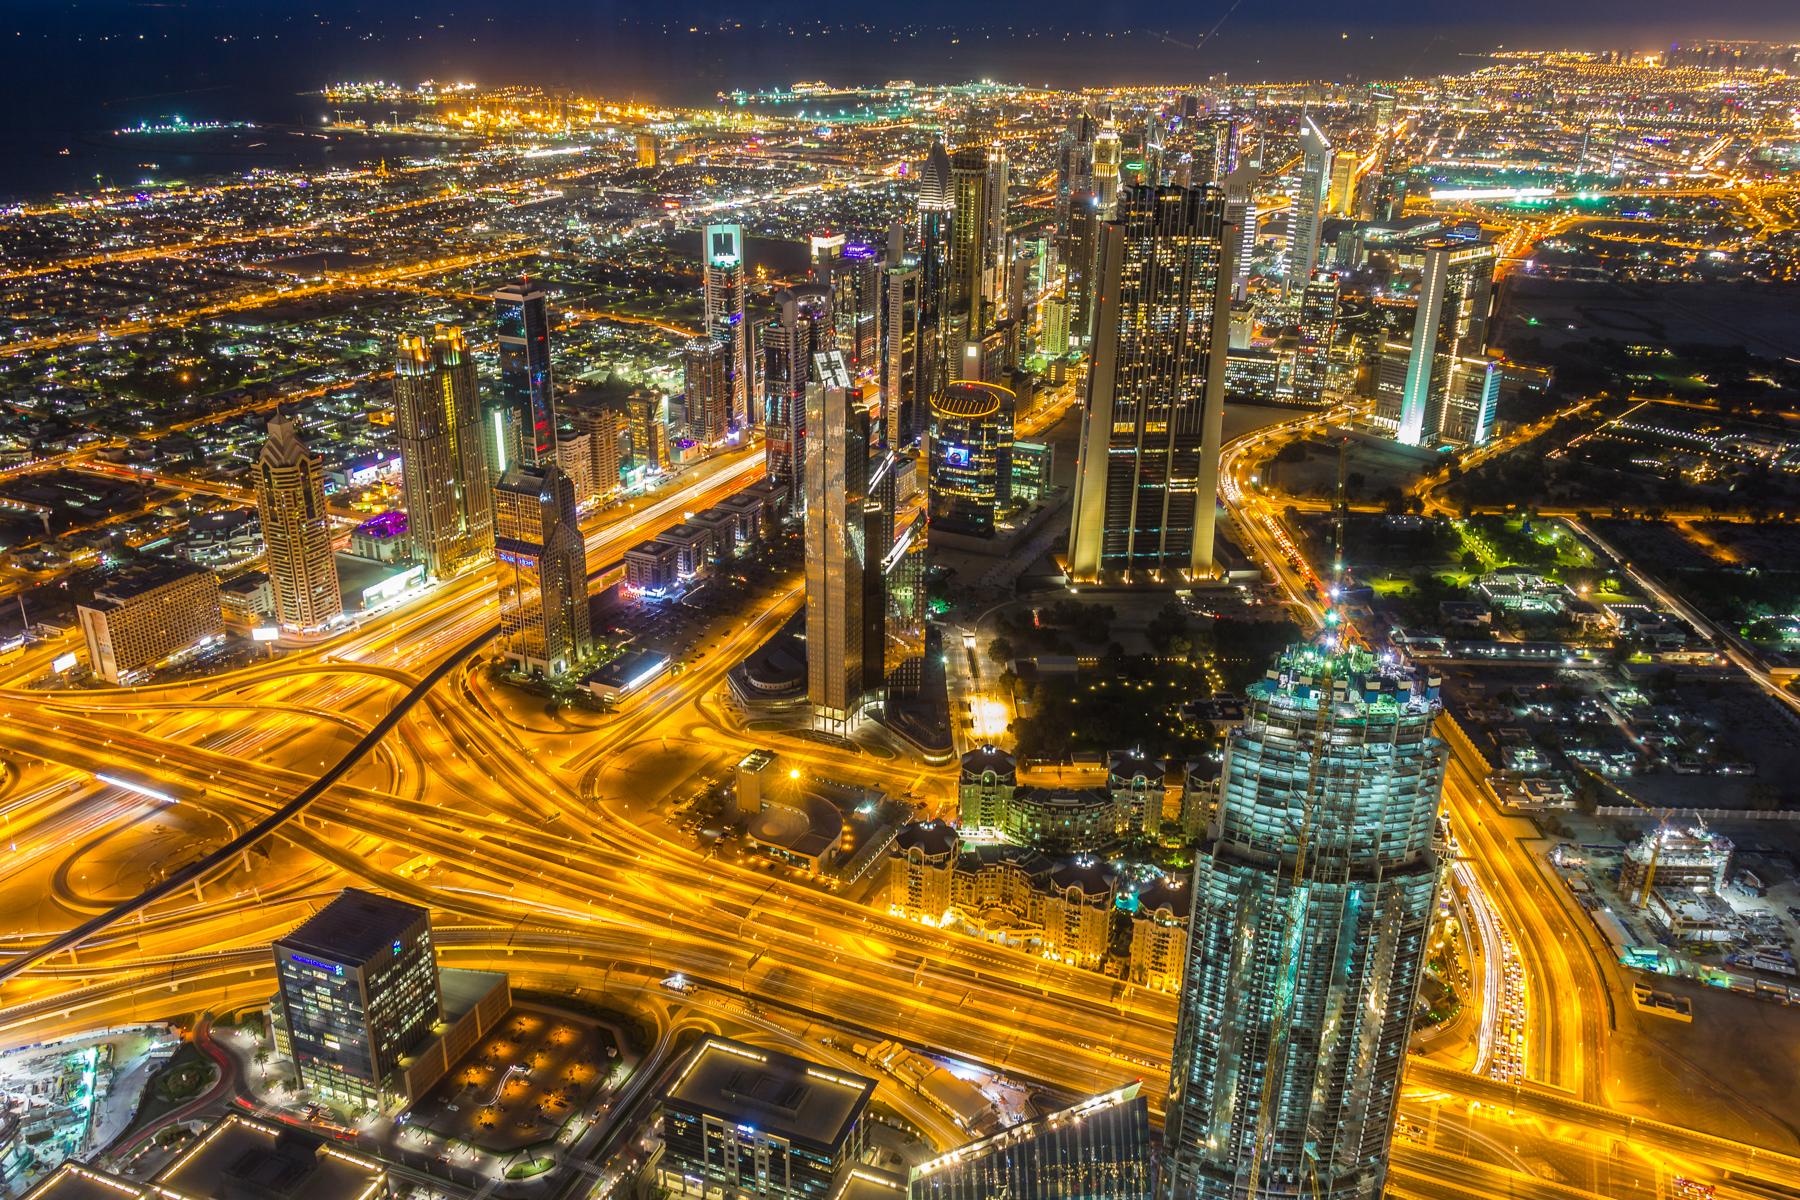 Urban & Cities